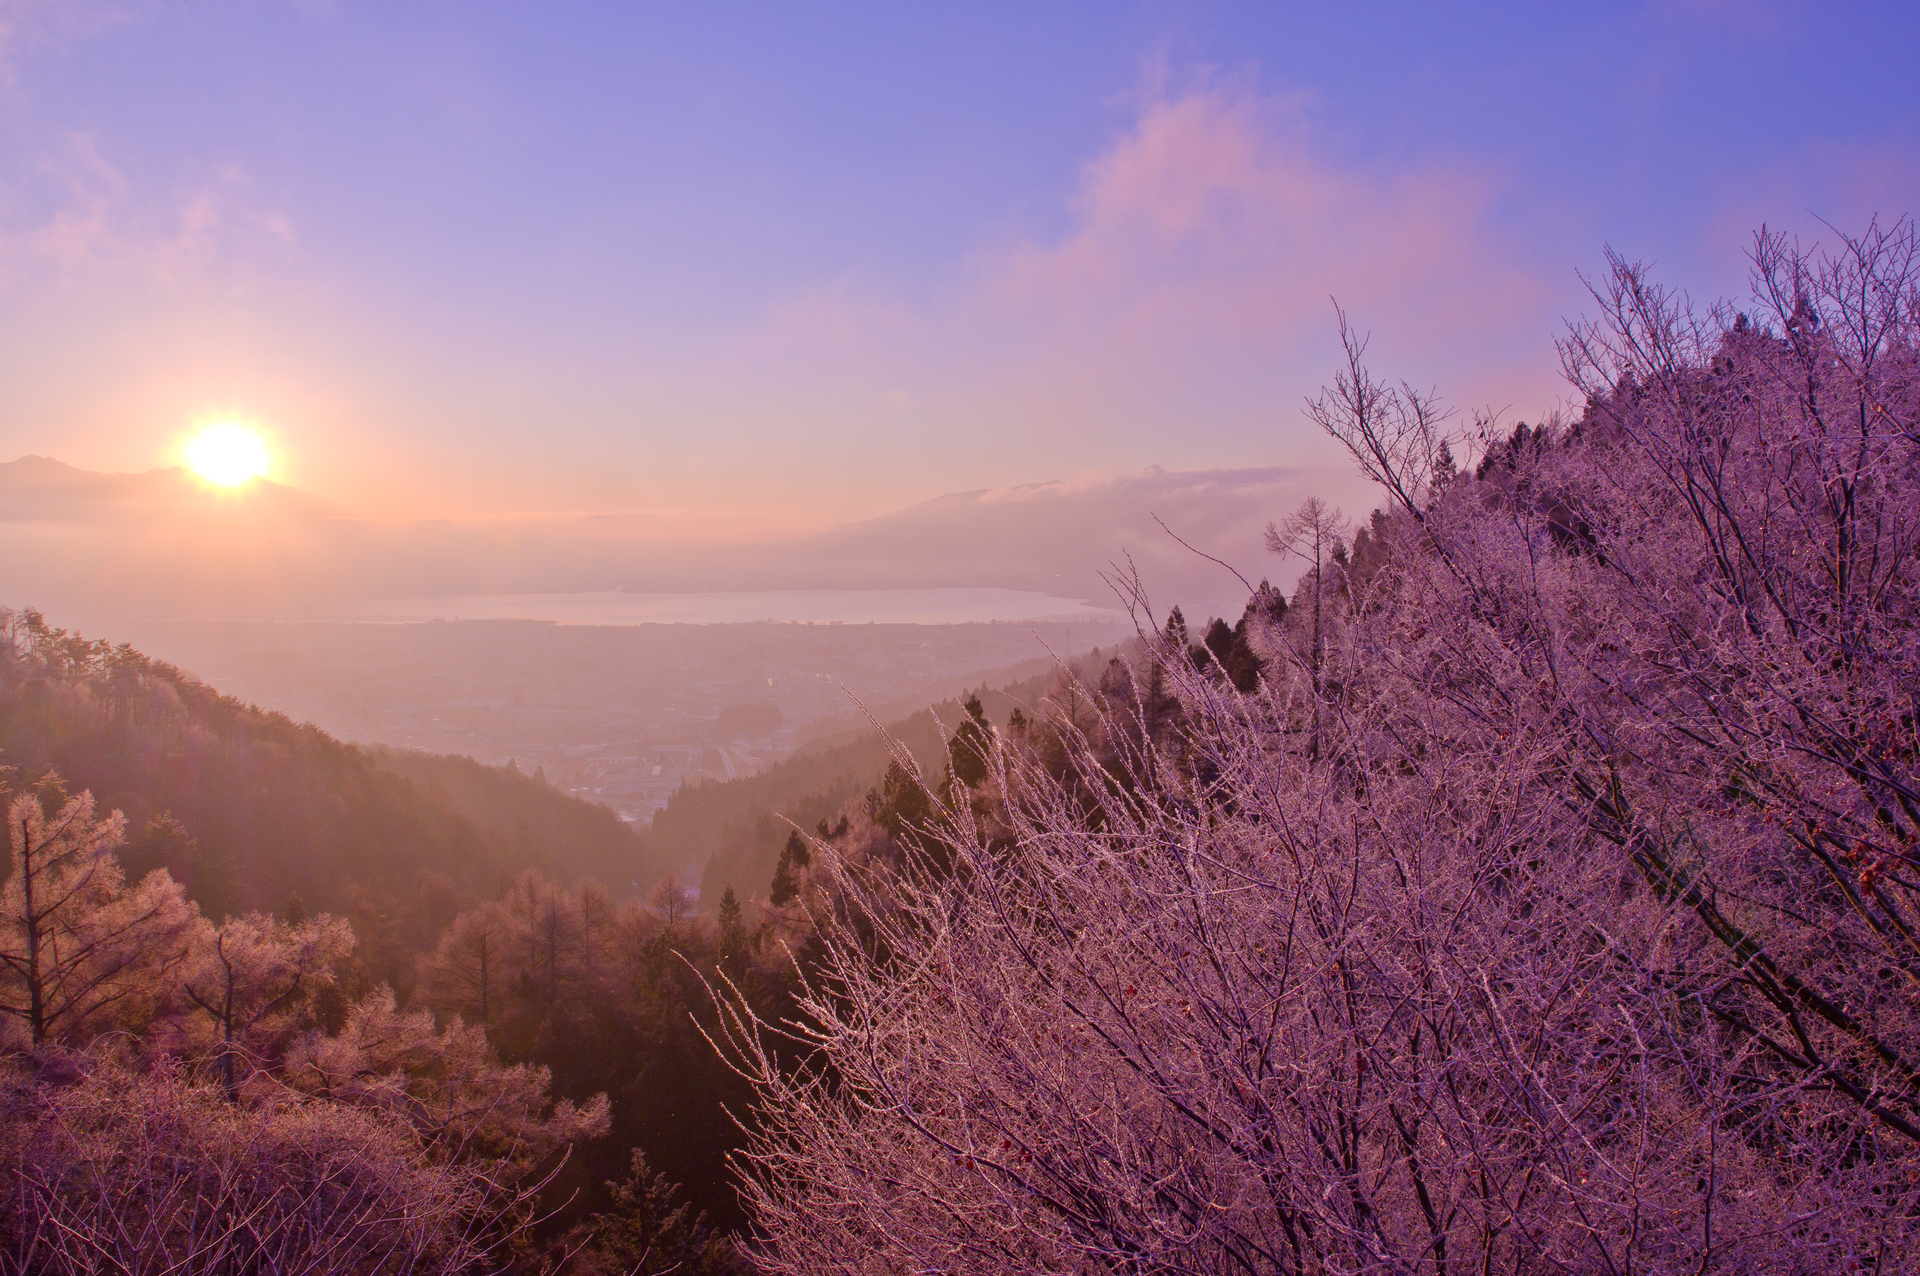 御野立公園 厳冬の朝日